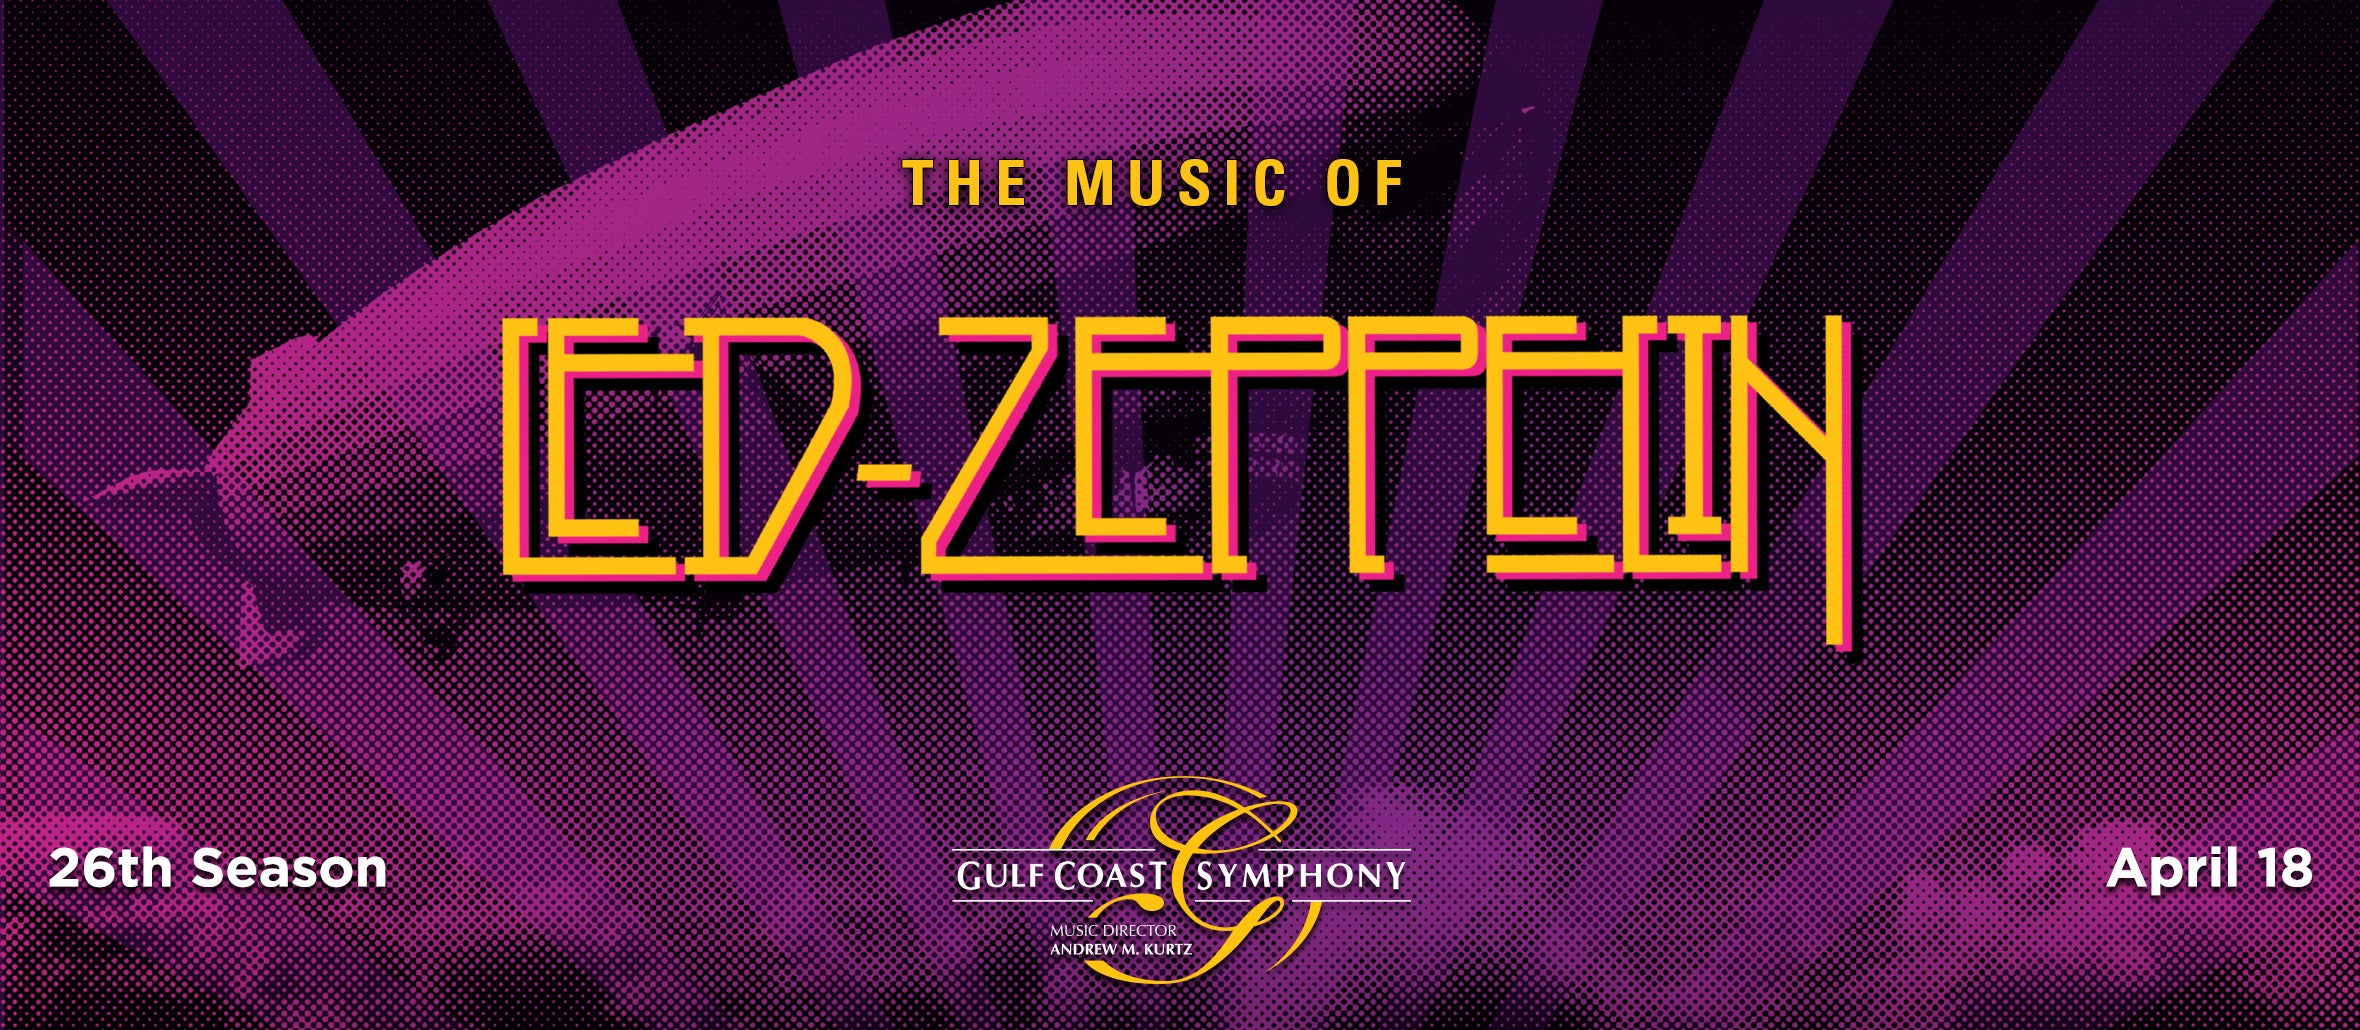 Gulf Coast Symphony: The Music of LED ZEPPELIN